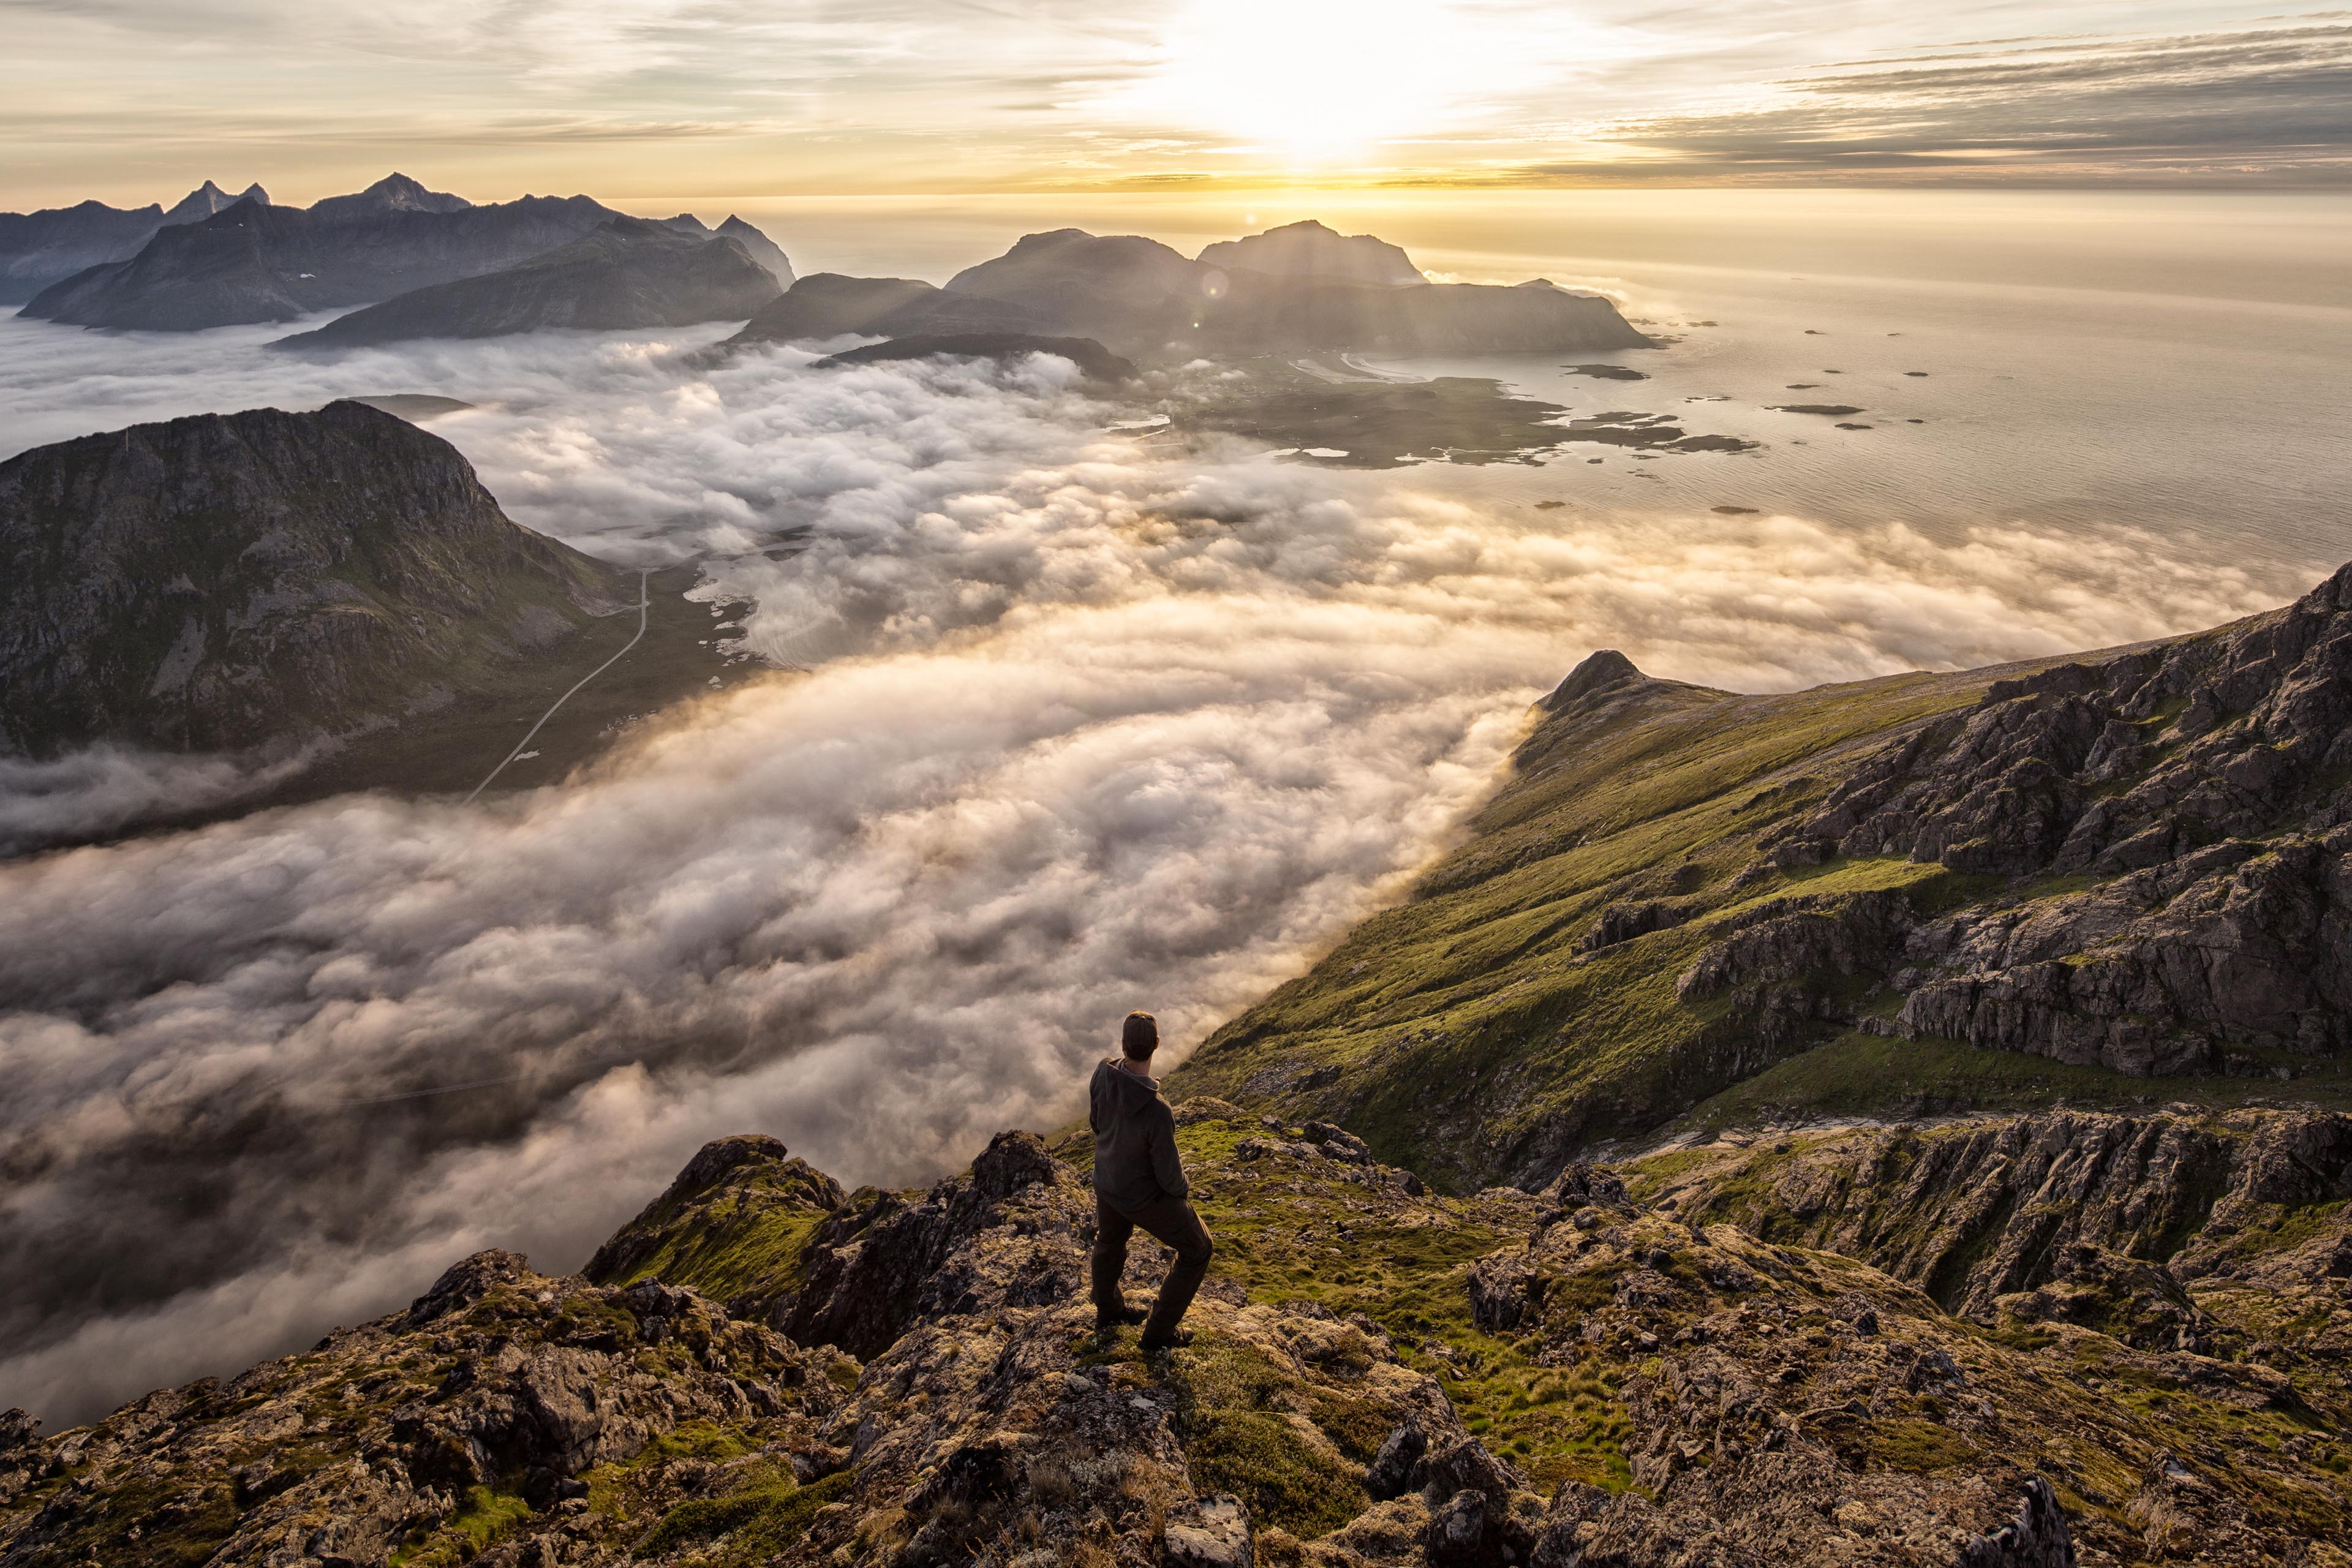 Man above the clouds on mountain Lofoten Norway